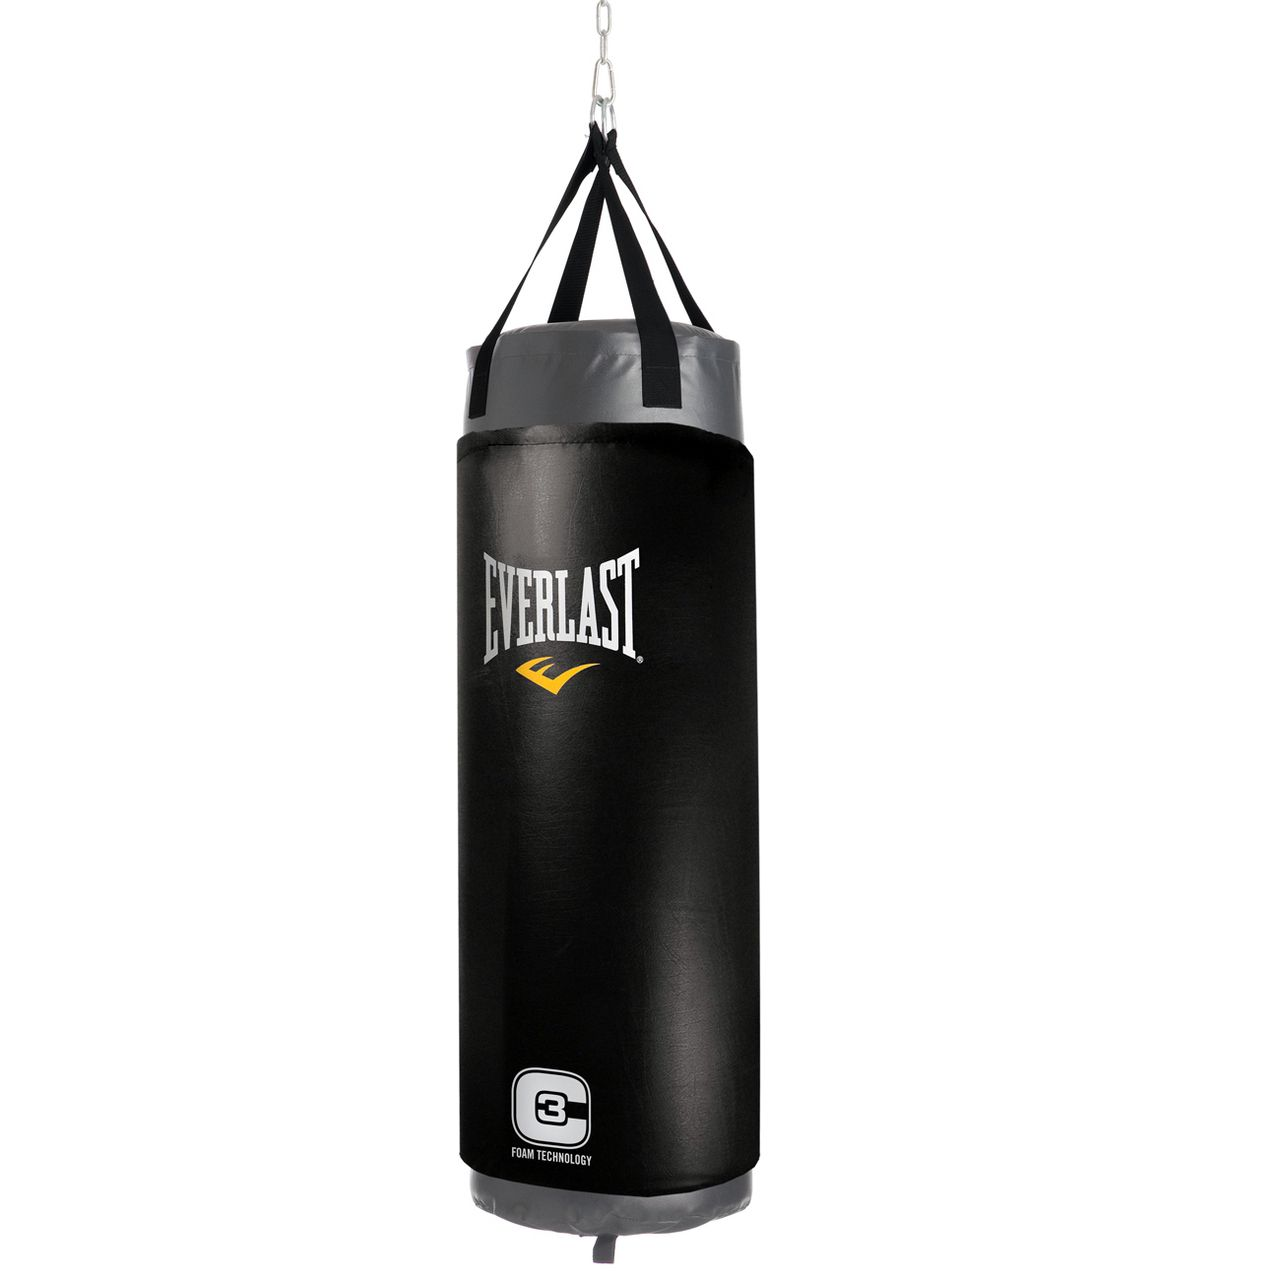 Everlast c3 foam heavy boxing bag heavy bags boxing